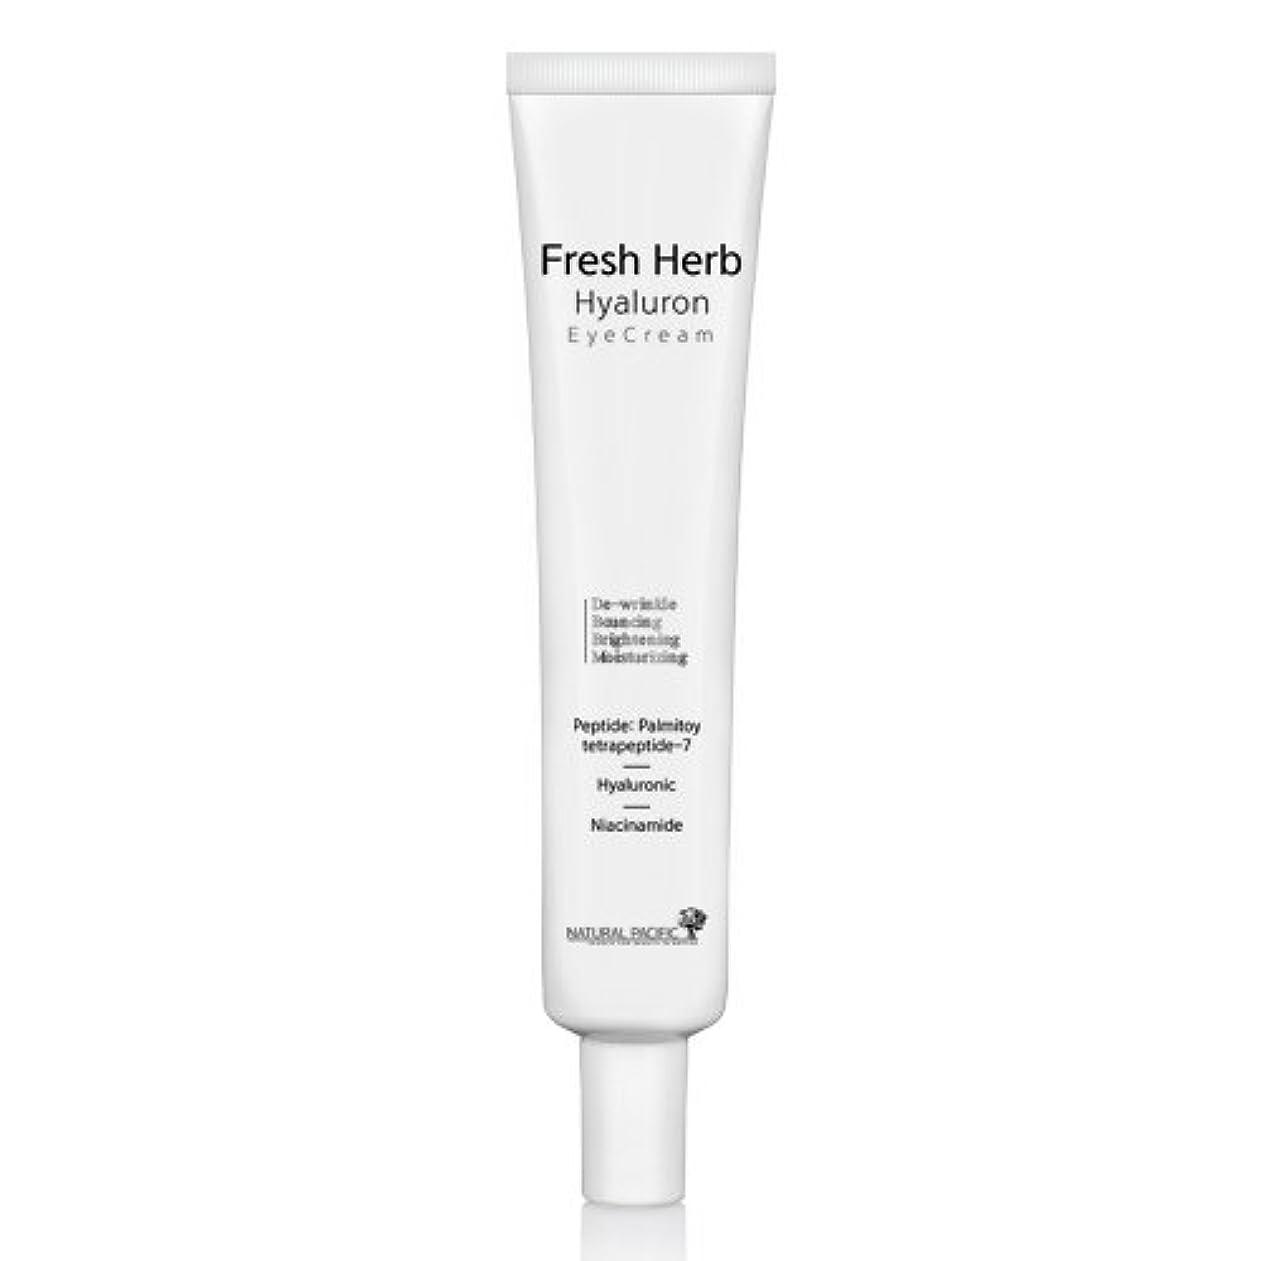 NATURAL PACIFIC Fresh Herb Hyaluron Eye Cream 30ml/ナチュラルパシフィック フレッシュ ハーブ ヒアルロン アイクリーム 30ml [並行輸入品]